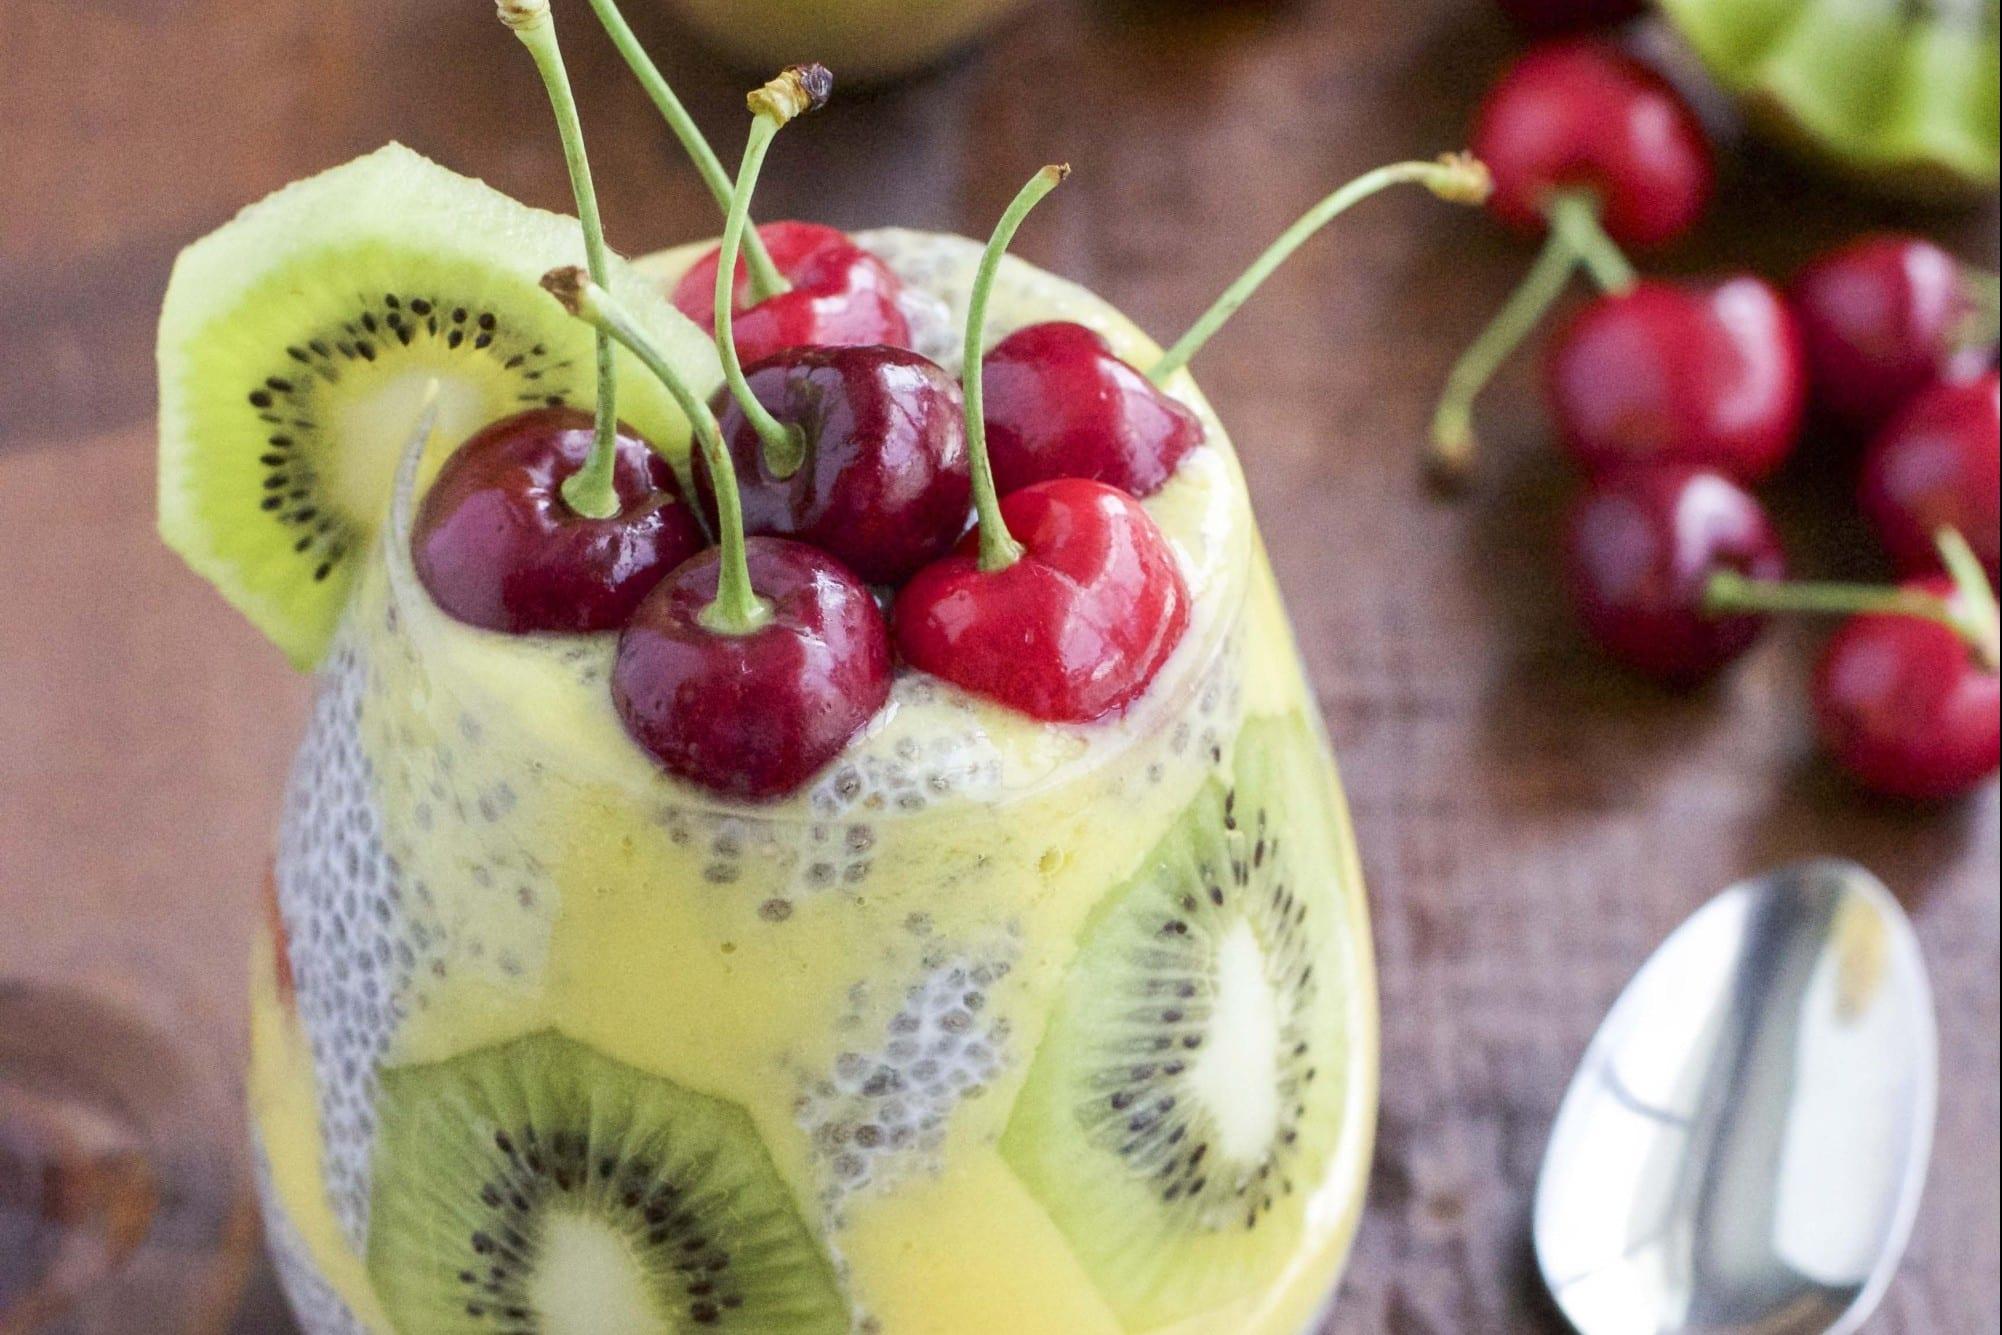 18 Chia Seed Pudding Recipes Everyone Will Love: Kiwi mango Cherry Chia Seed Pudding